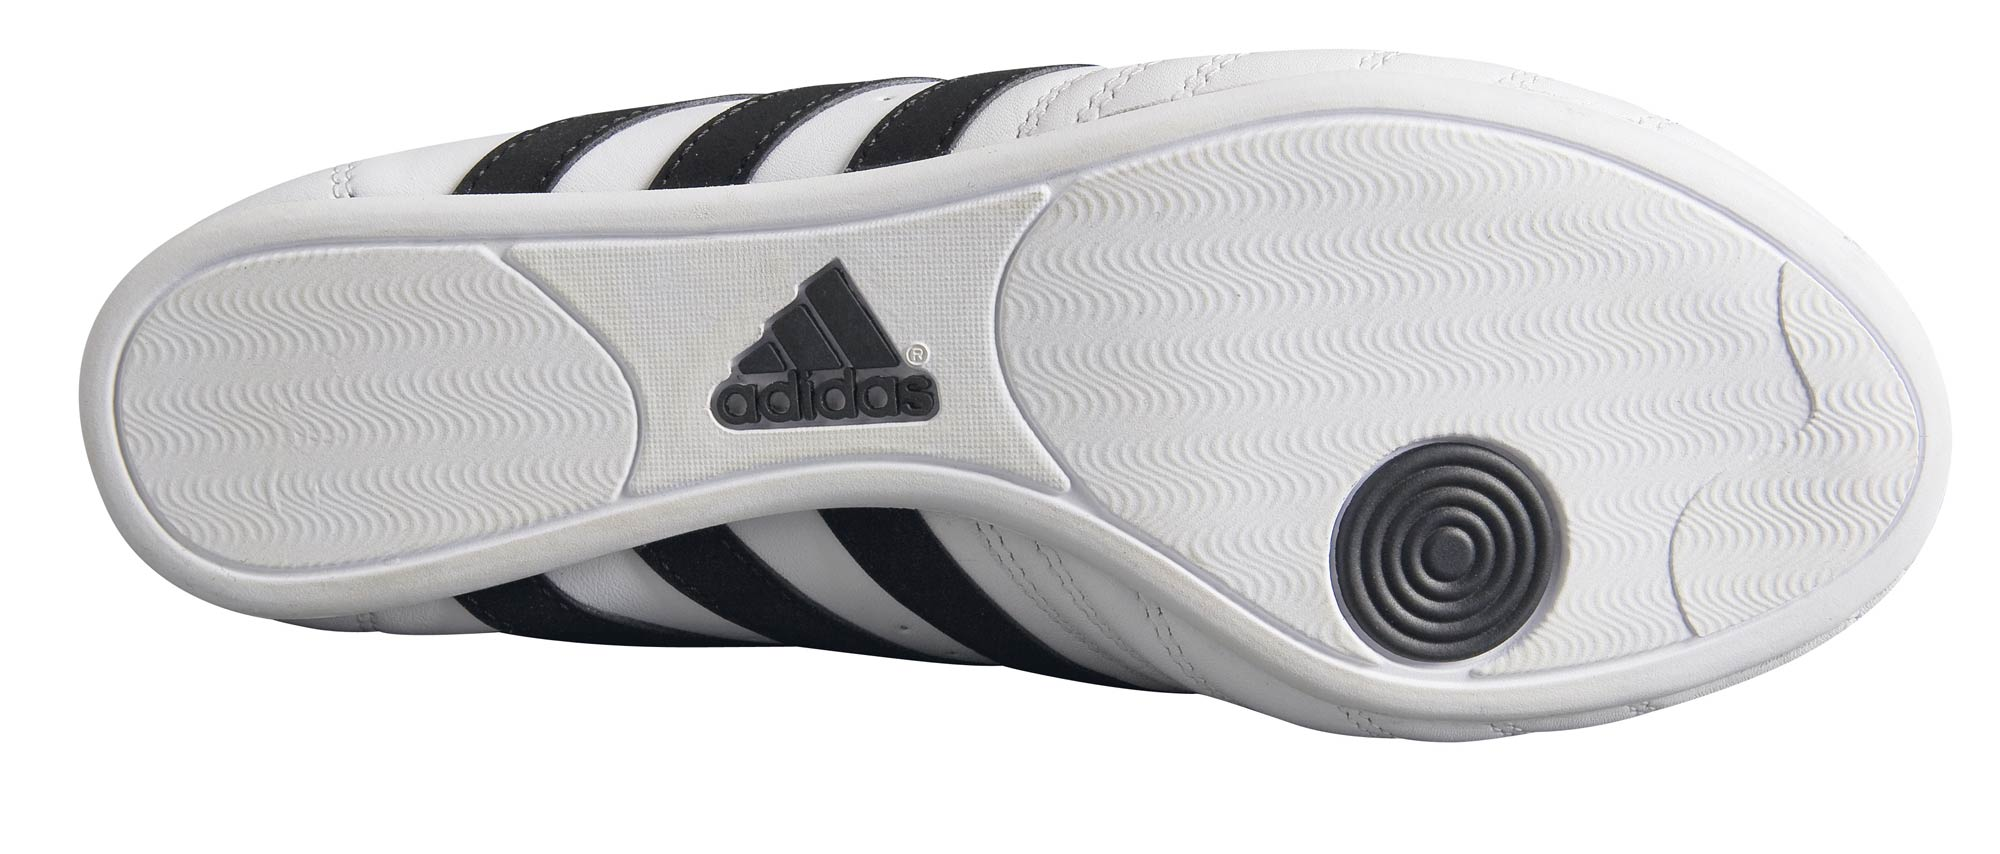 adidas TDK Trainer Herren Sneaker Sportschuhe Gr. 46 23 UK